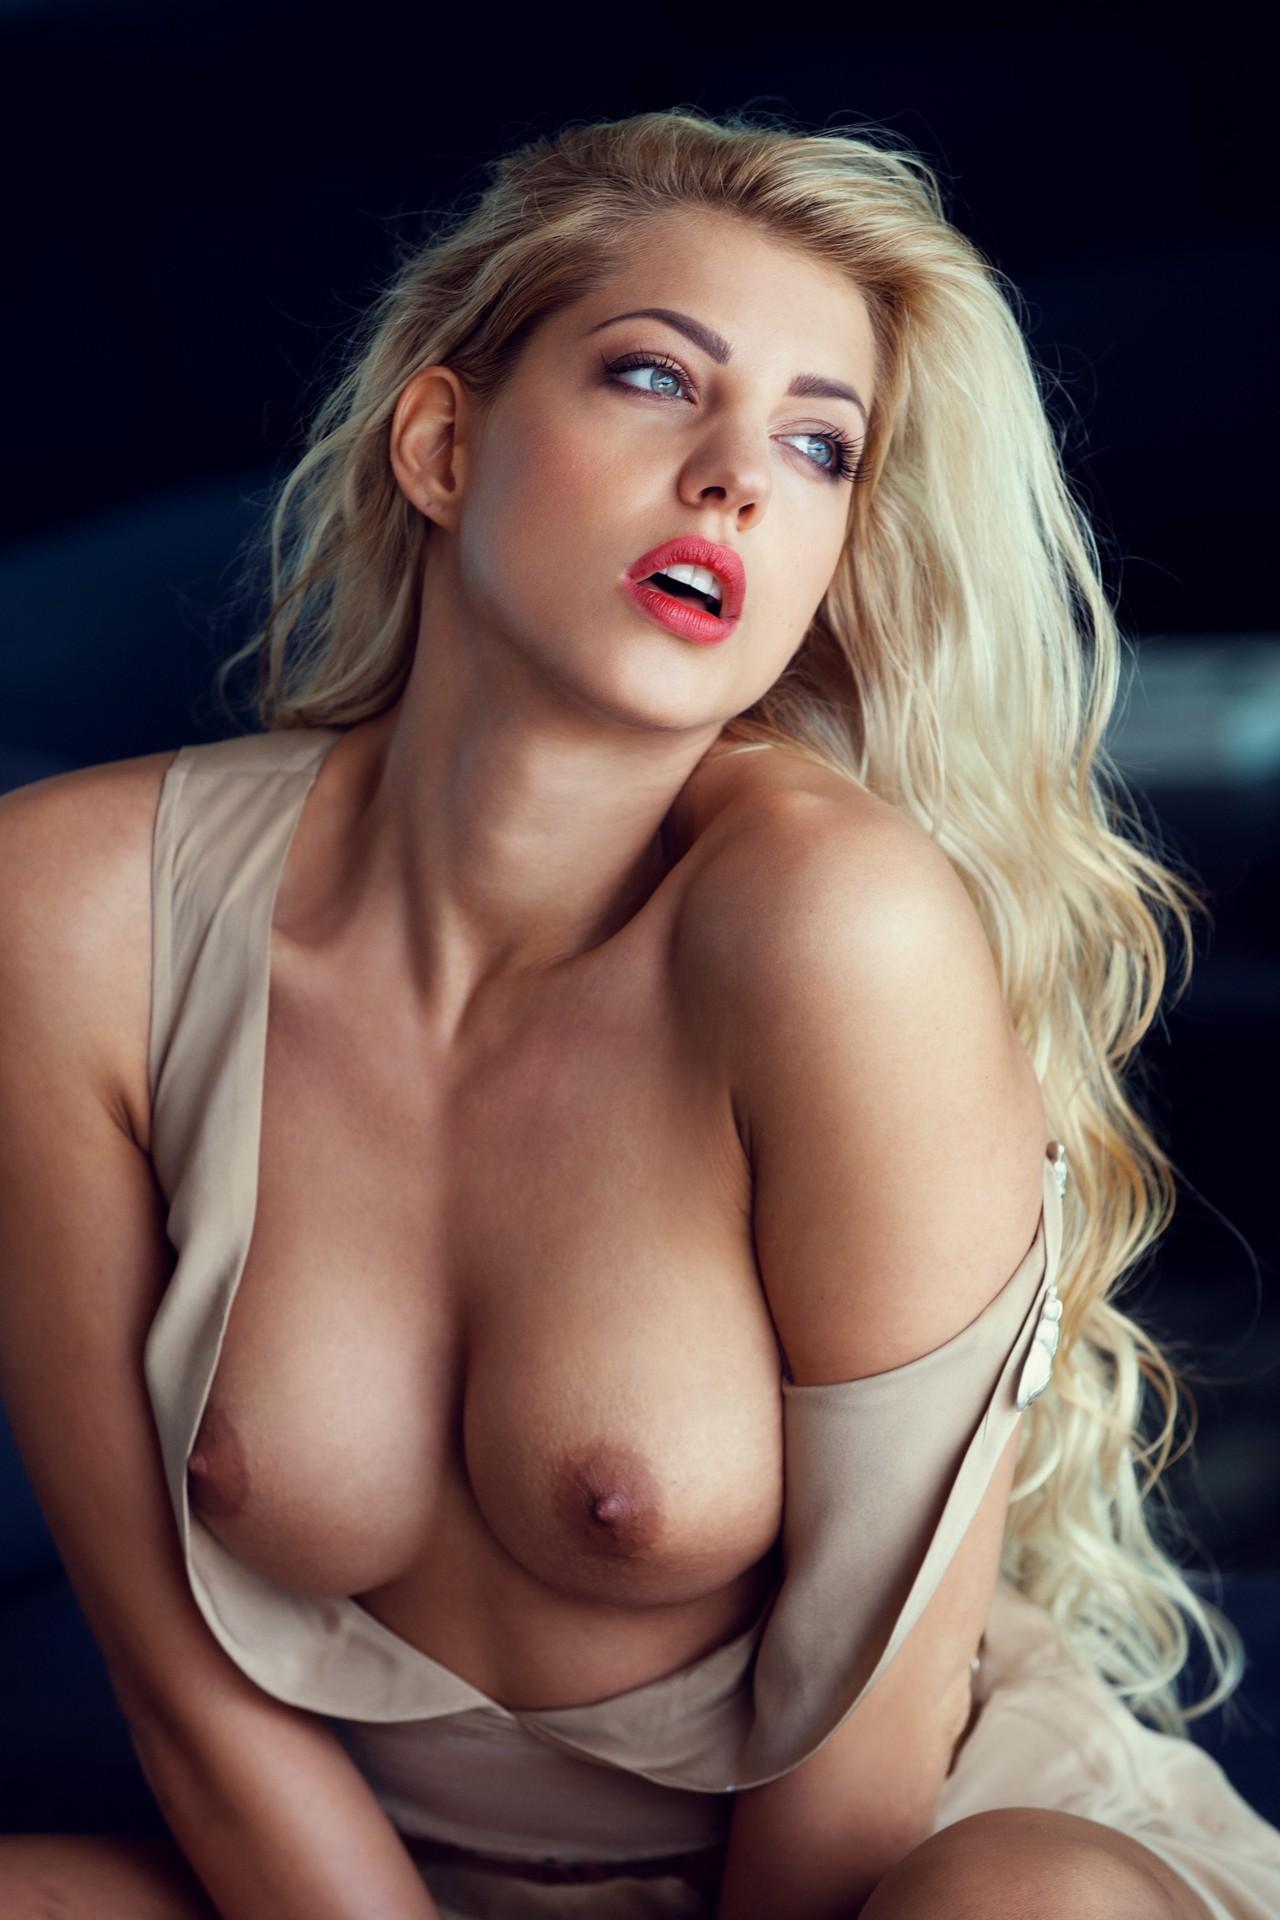 Bilder sarah nowak nackt Playmate Wallpaper